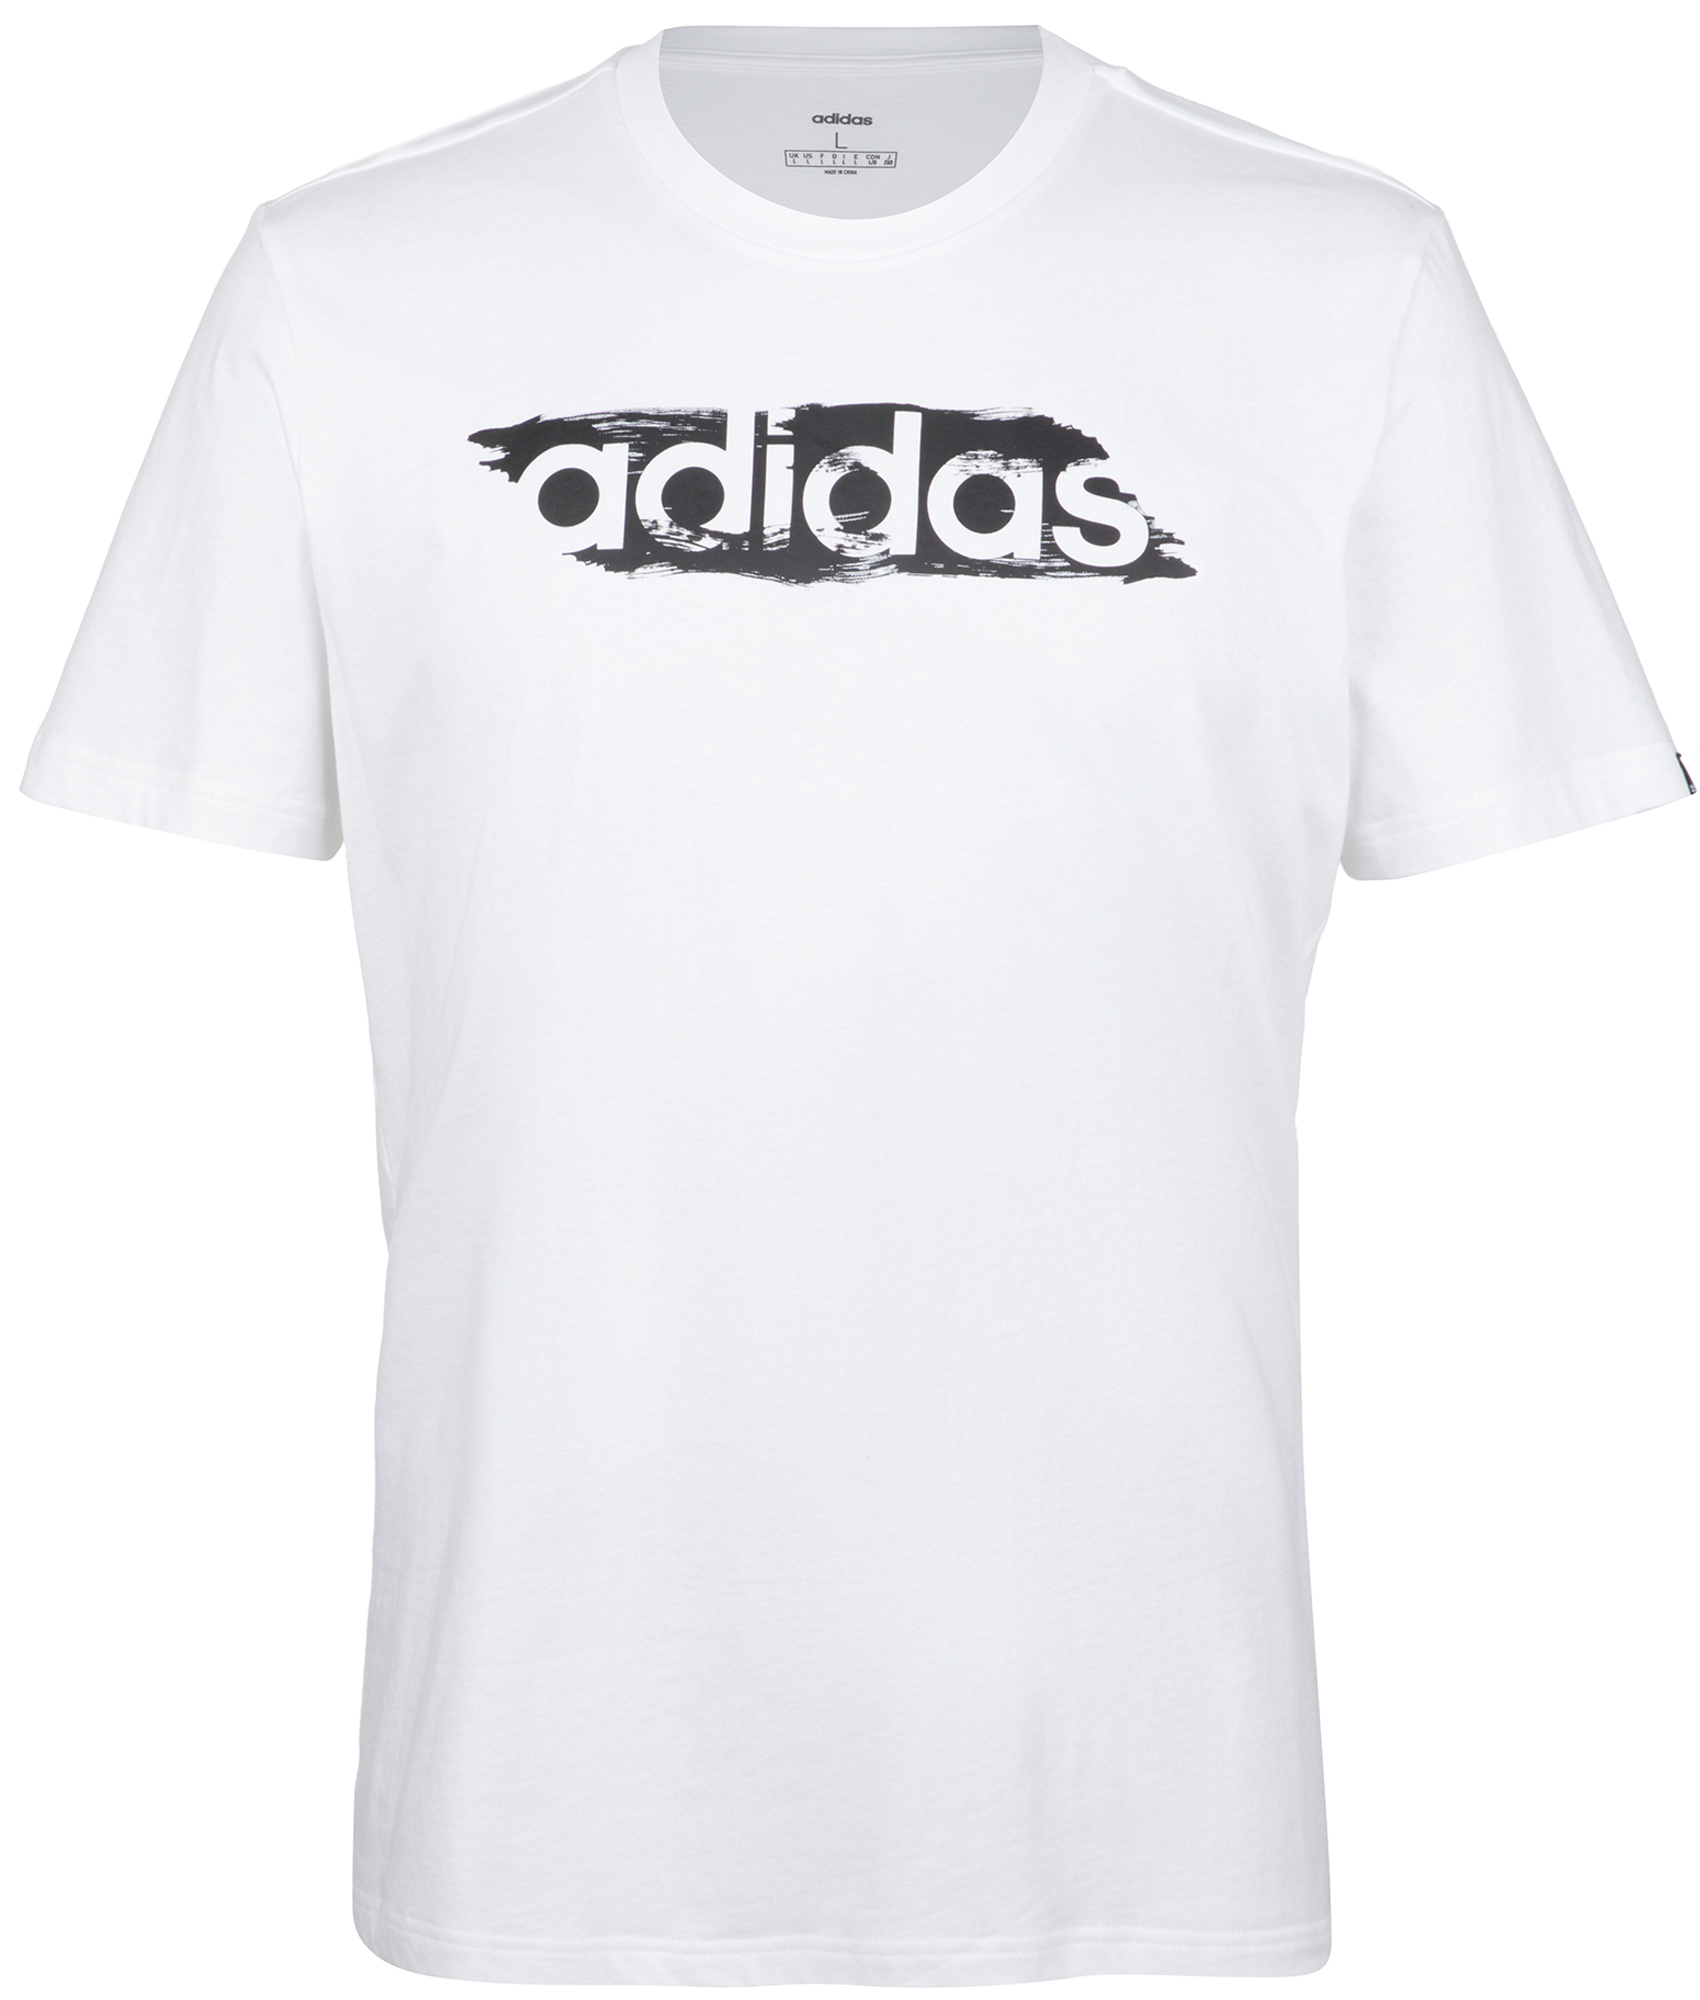 цена Adidas Футболка мужская Adidas Brushstroke, размер 60-62 онлайн в 2017 году